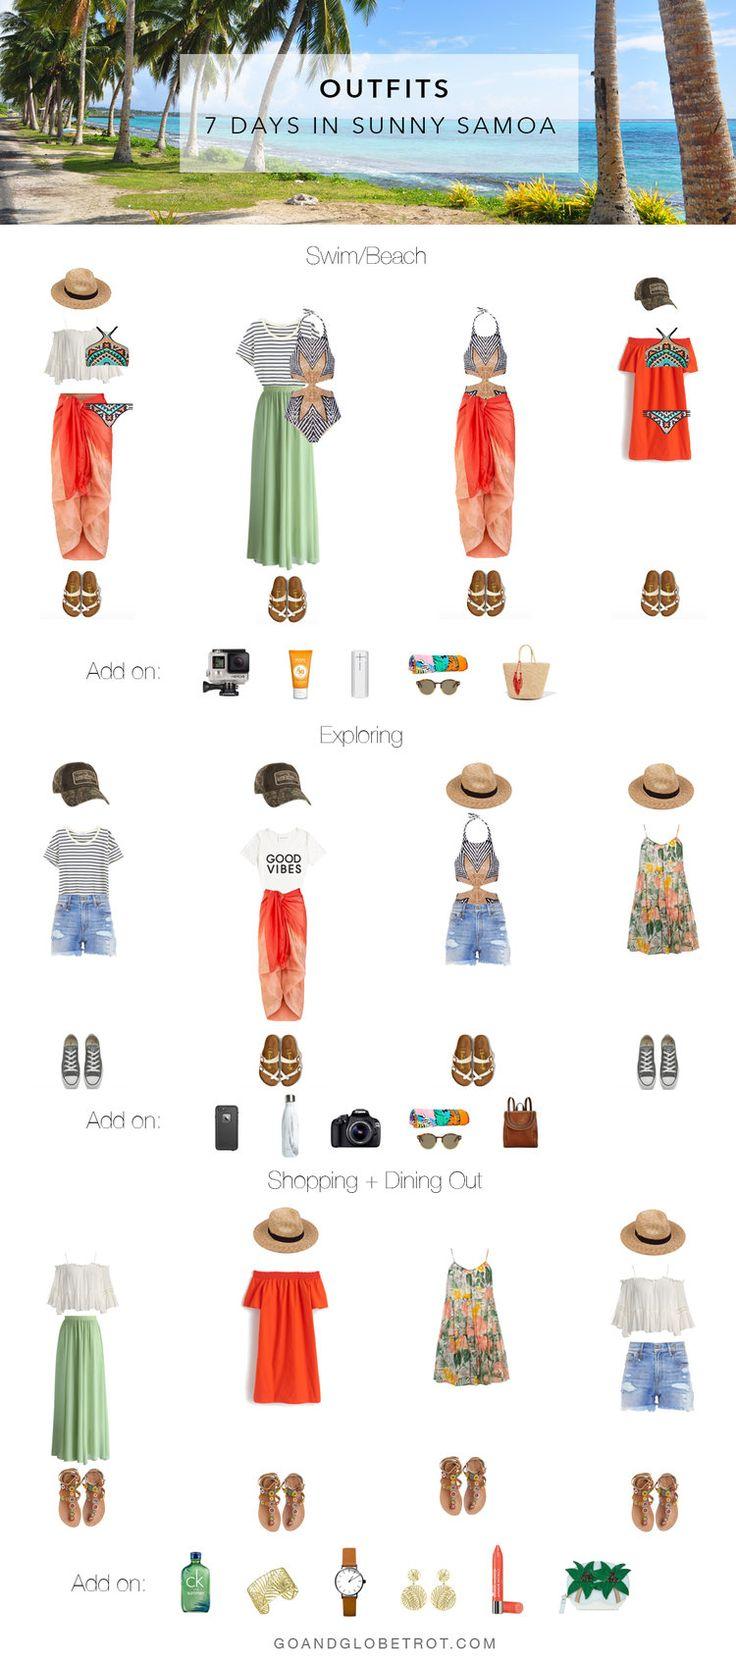 Outfits: 7 Days in Sunny Samoa   goandglobetrot.com